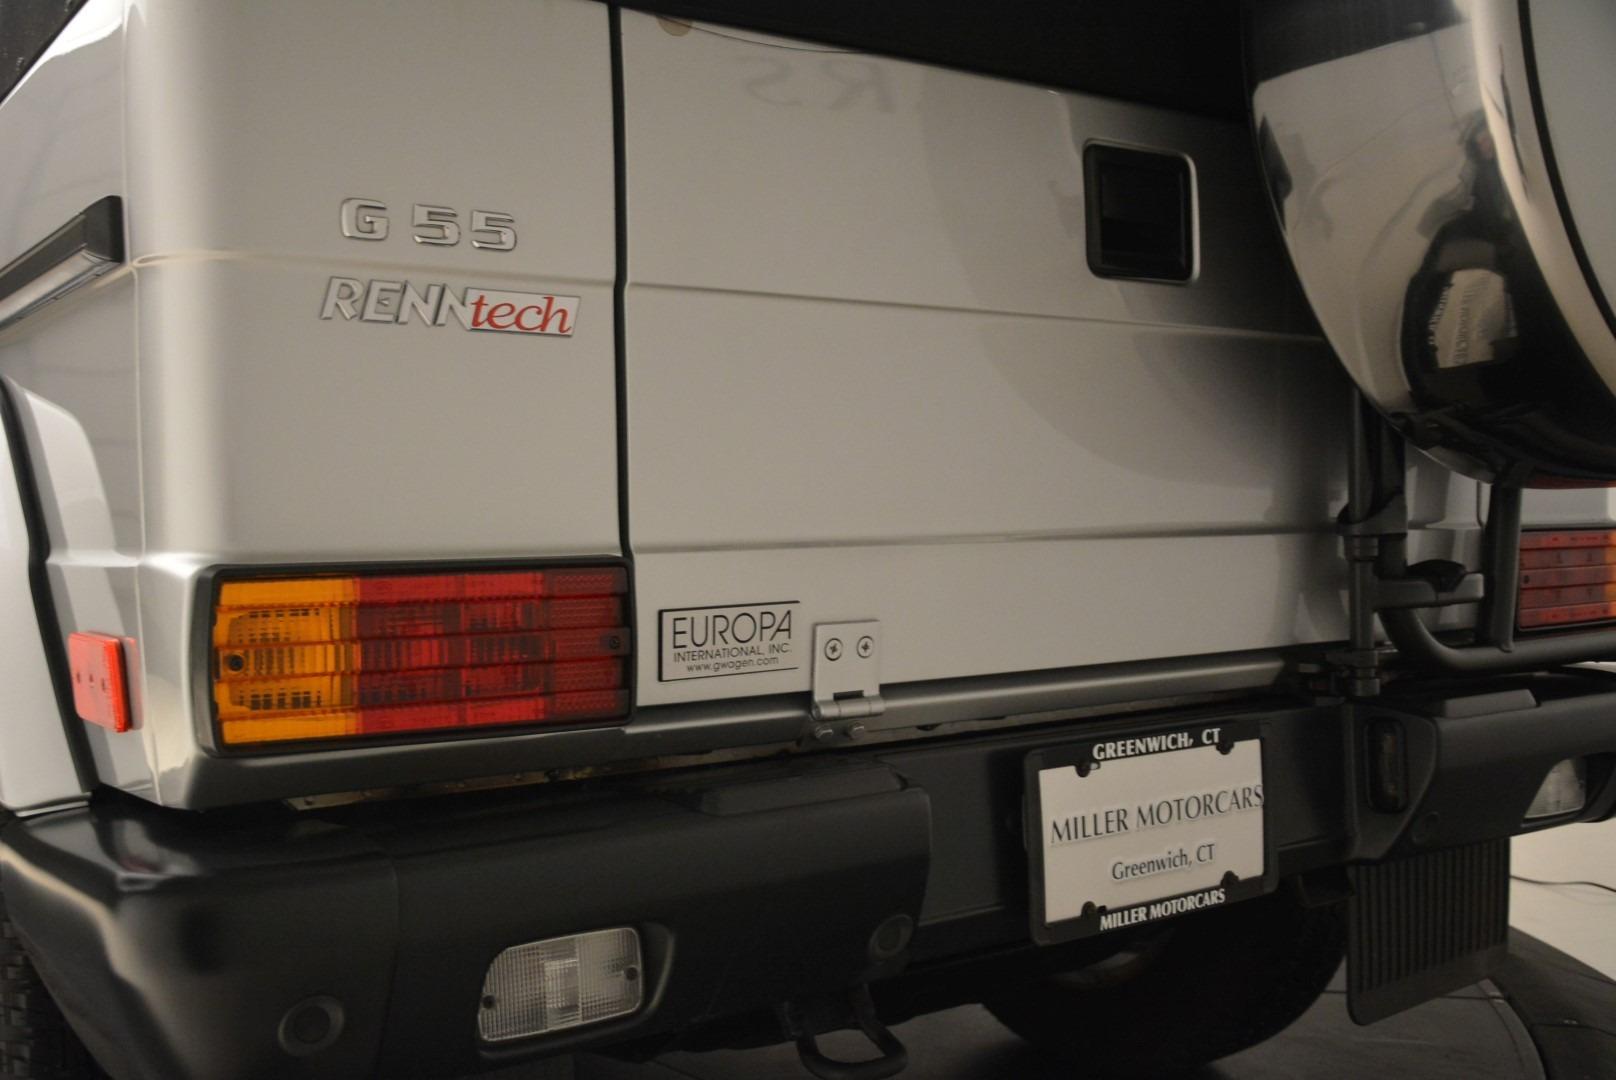 Used 2000 Mercedes-Benz G500 RENNTech  For Sale In Westport, CT 2184_p23